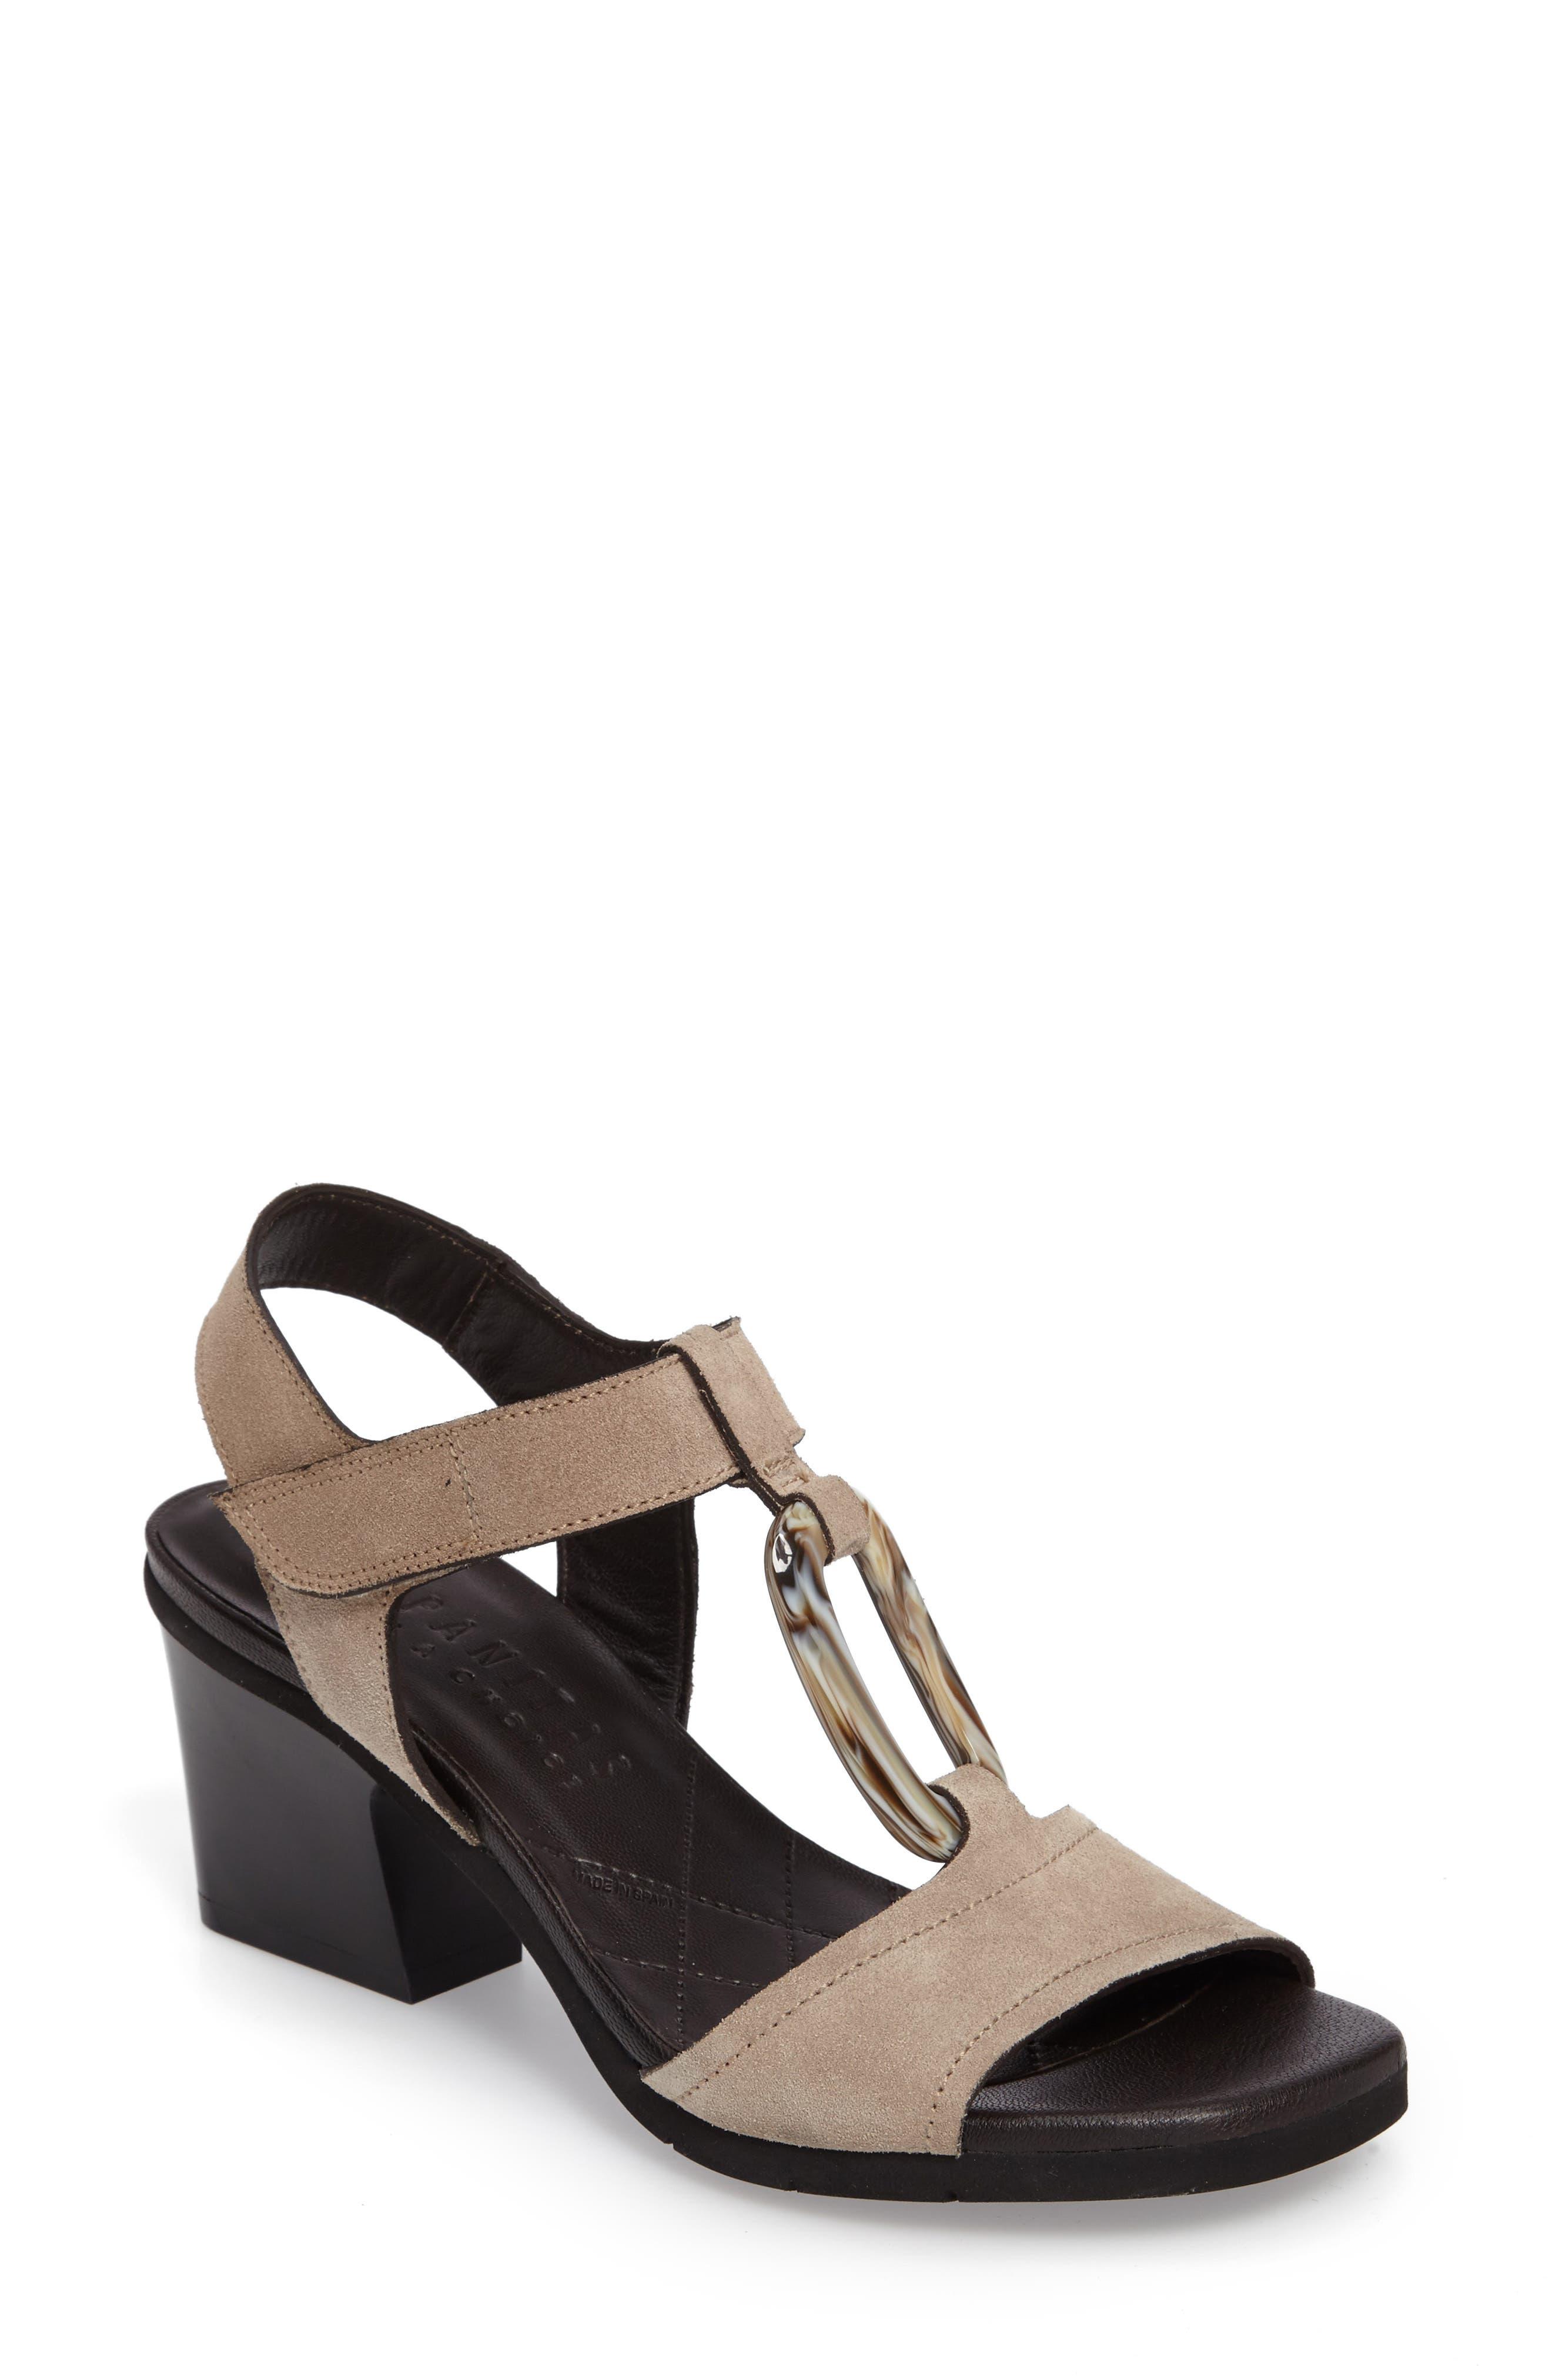 Ursula Ringed T-Strap Sandal,                             Main thumbnail 1, color,                             Velour Elm Fabric